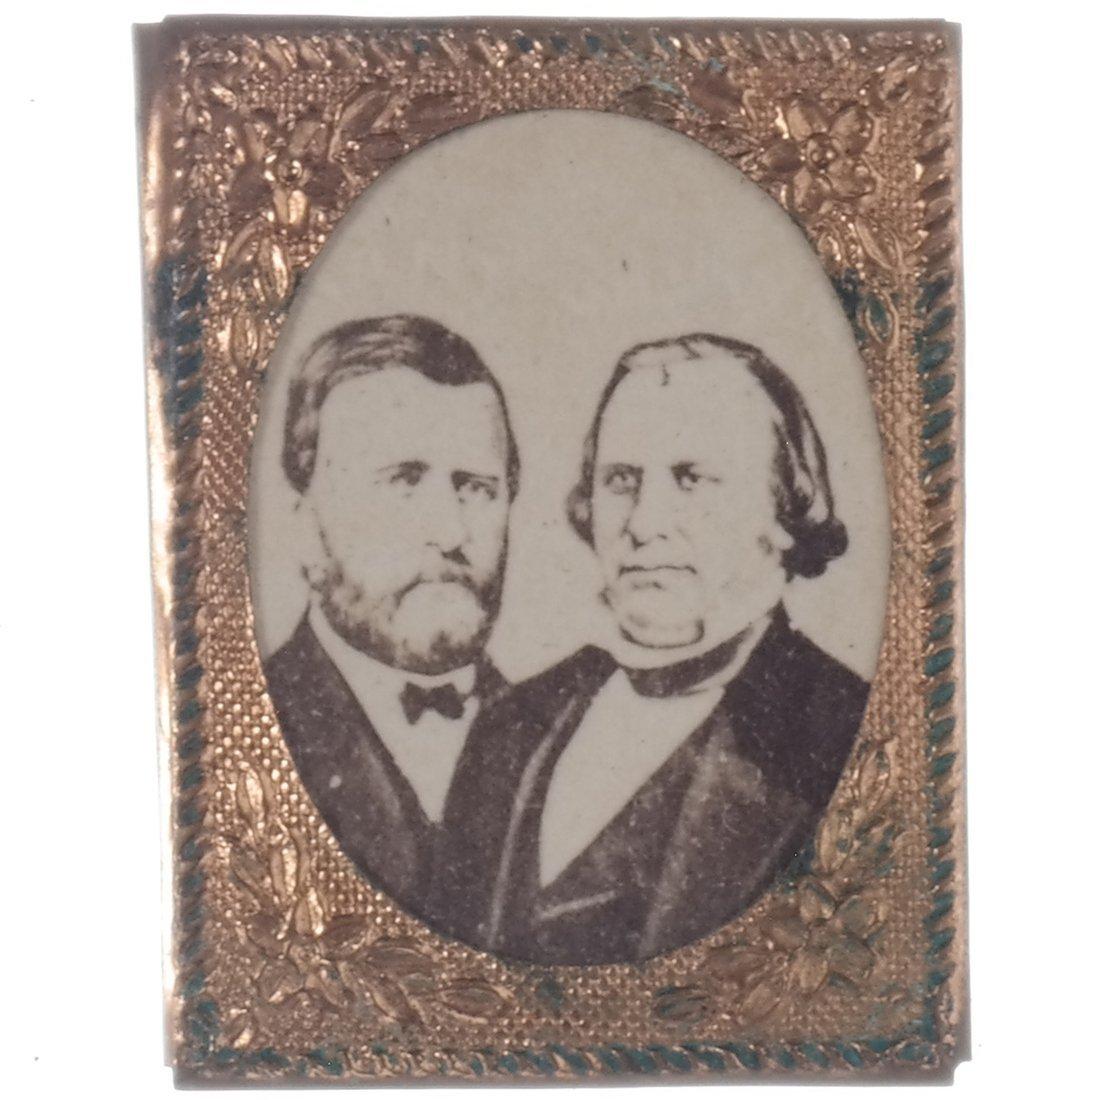 Grant & Wilson 1872 Jugate Albumen